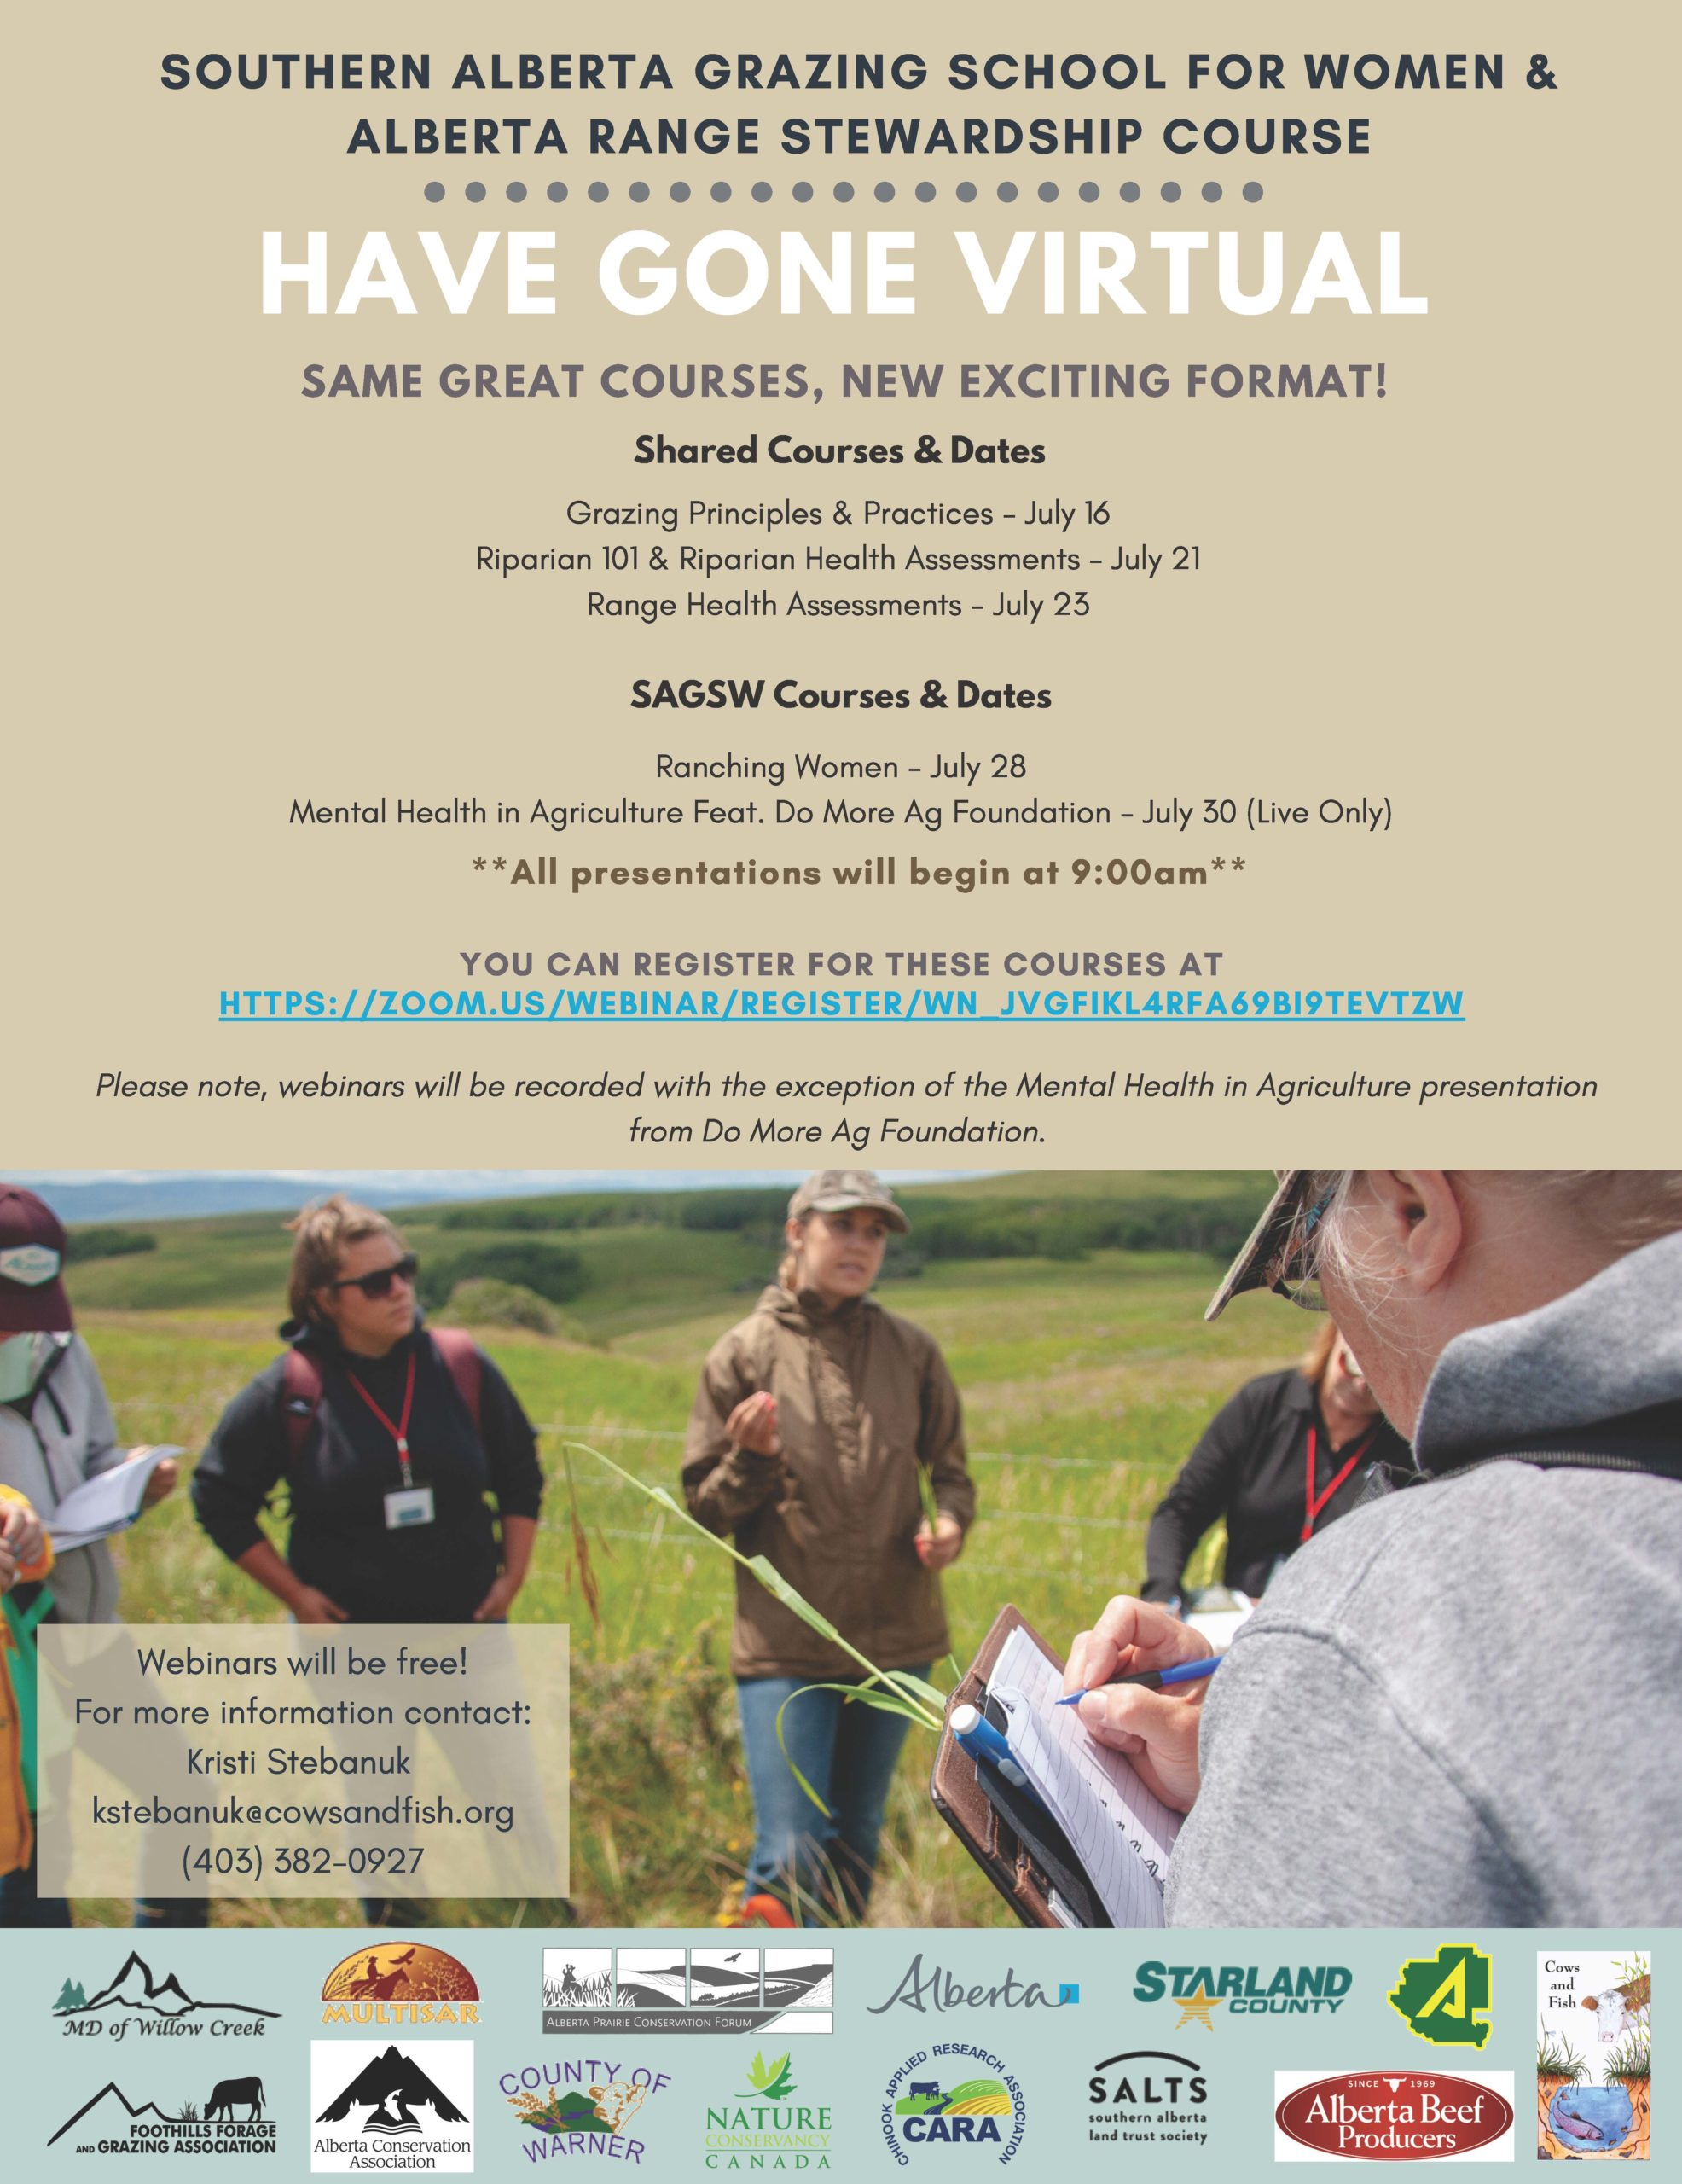 Southern Alberta Grazing School for Women and Alberta Range Stewardship Course